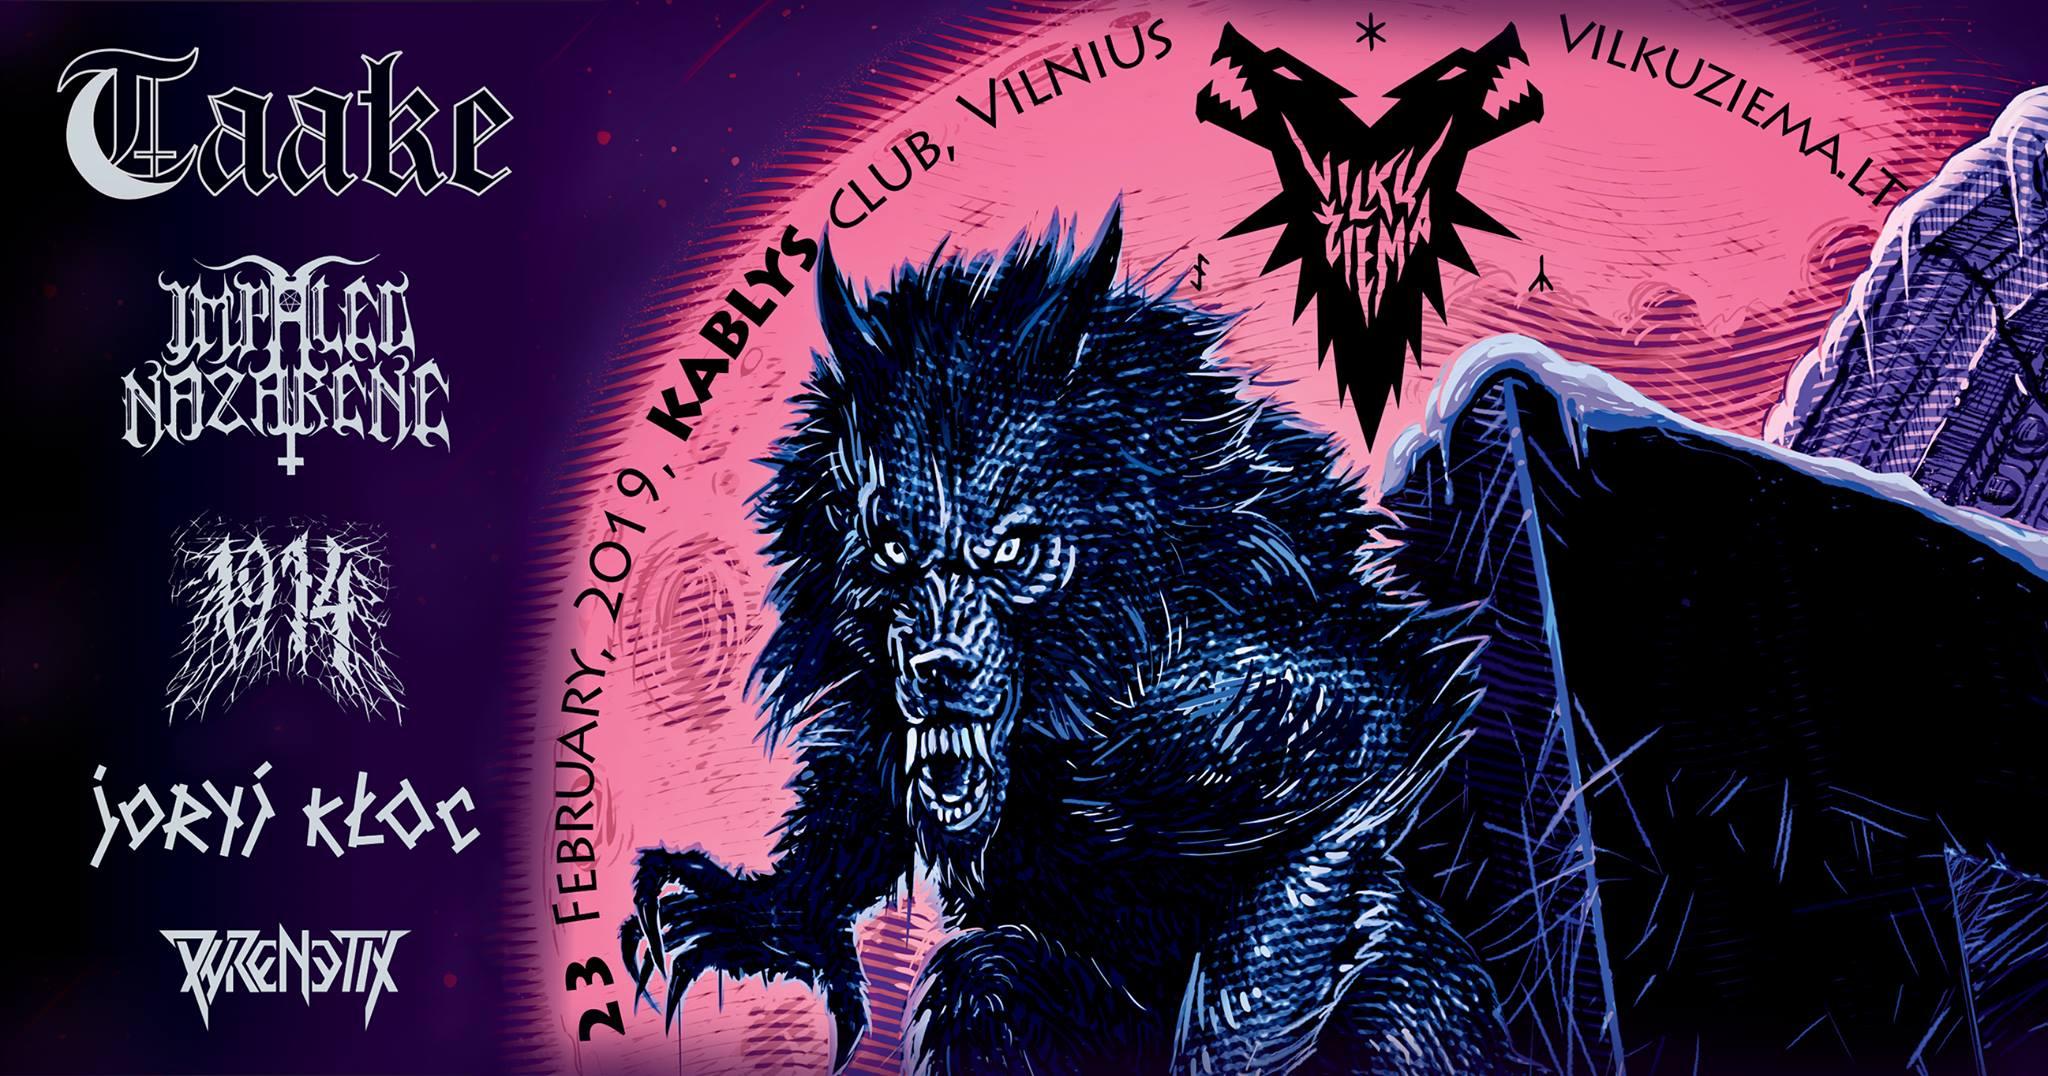 Winter of Wolves 2019 - All Metal Festivals